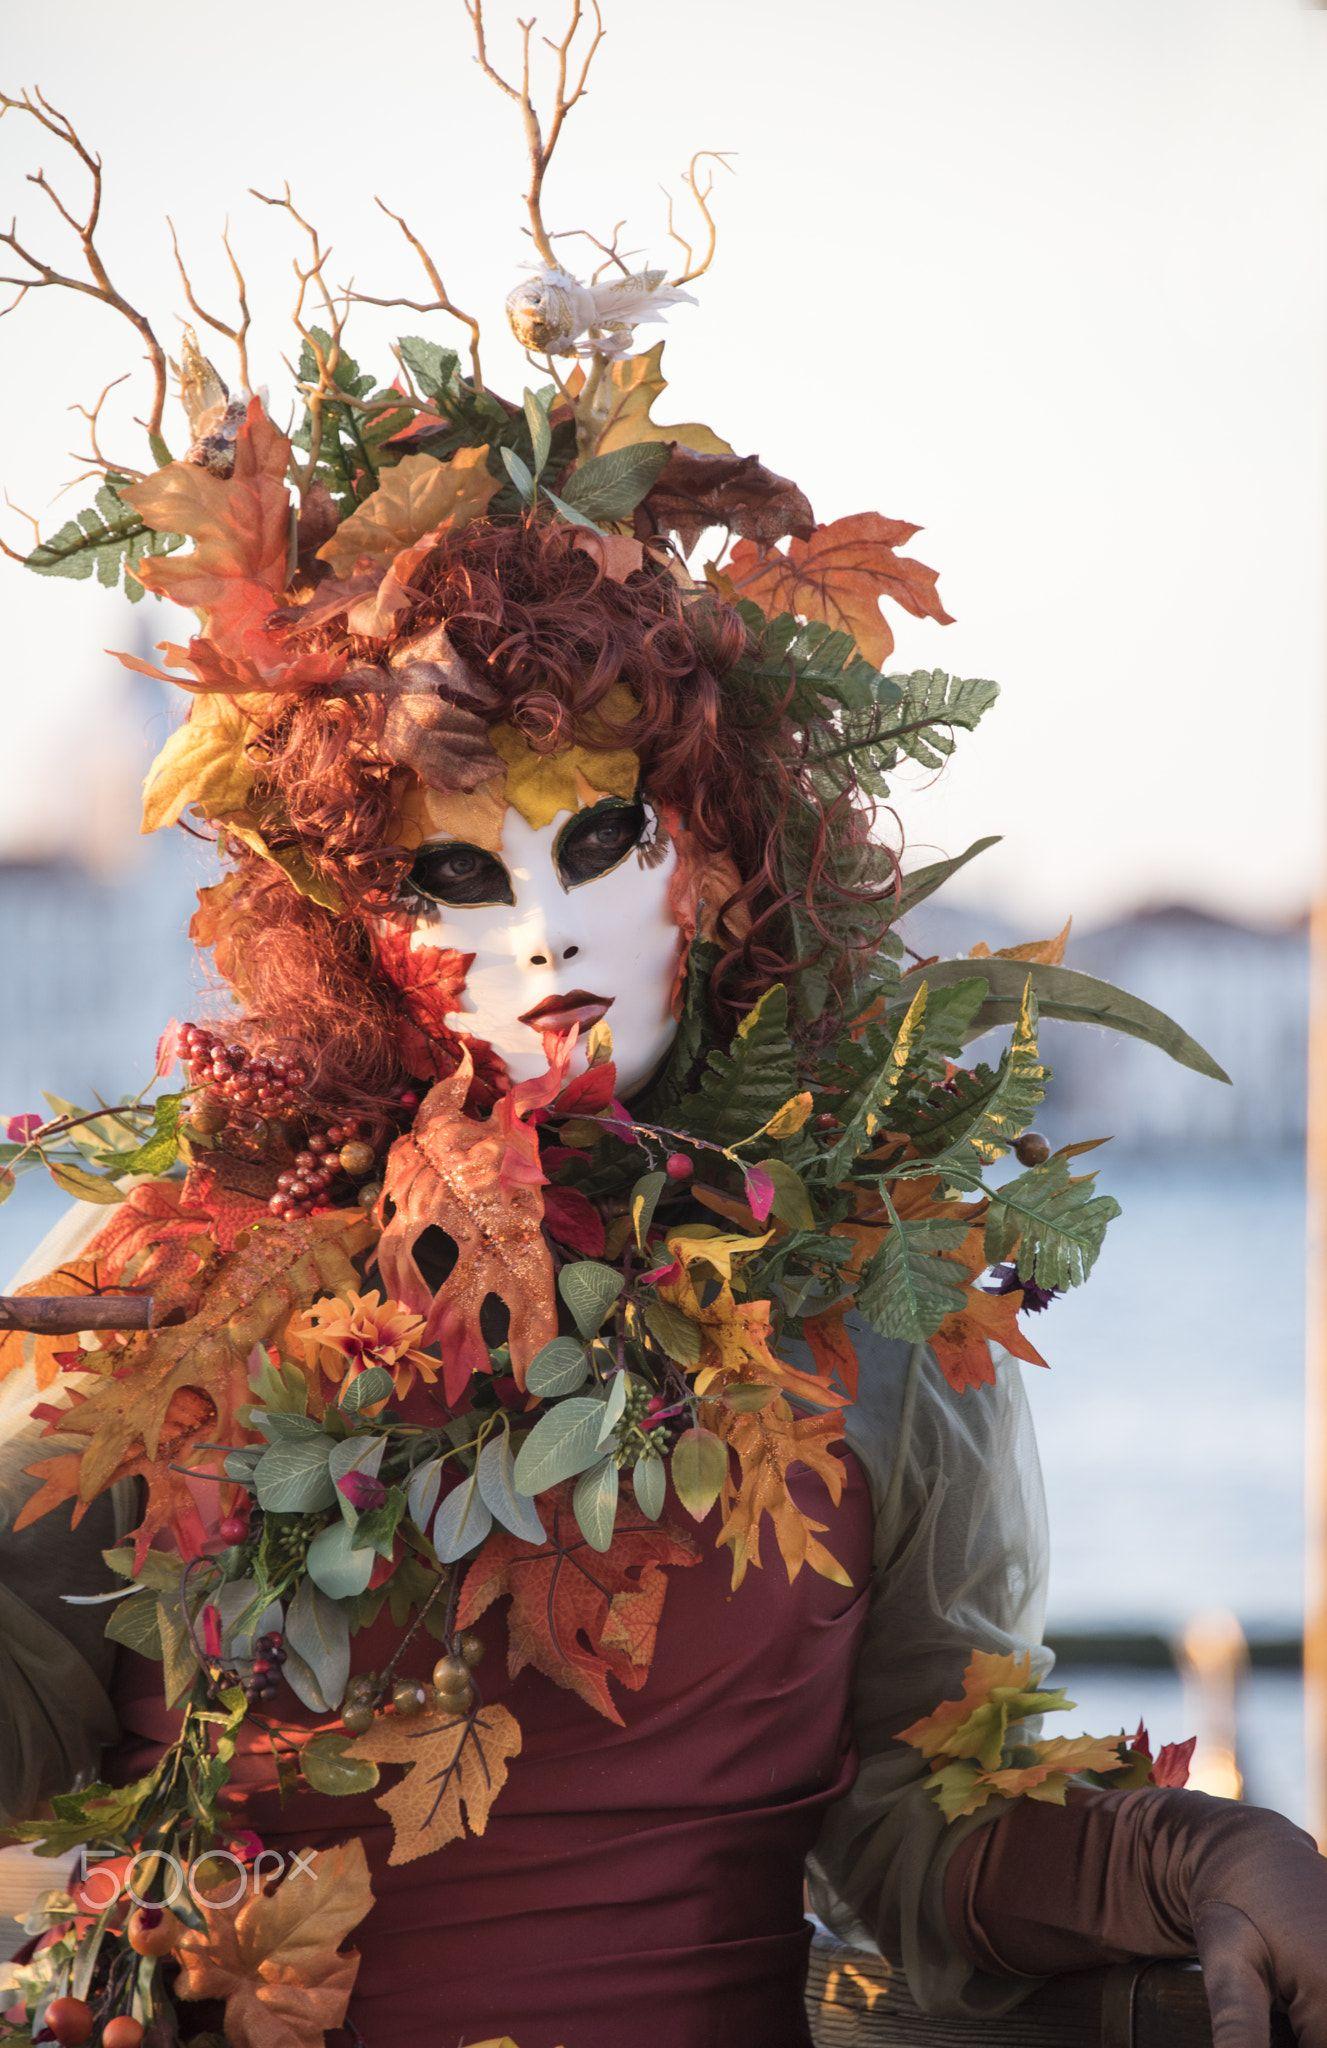 Carnevale di Venezia, Venice Carnival 2019 - Venice ...